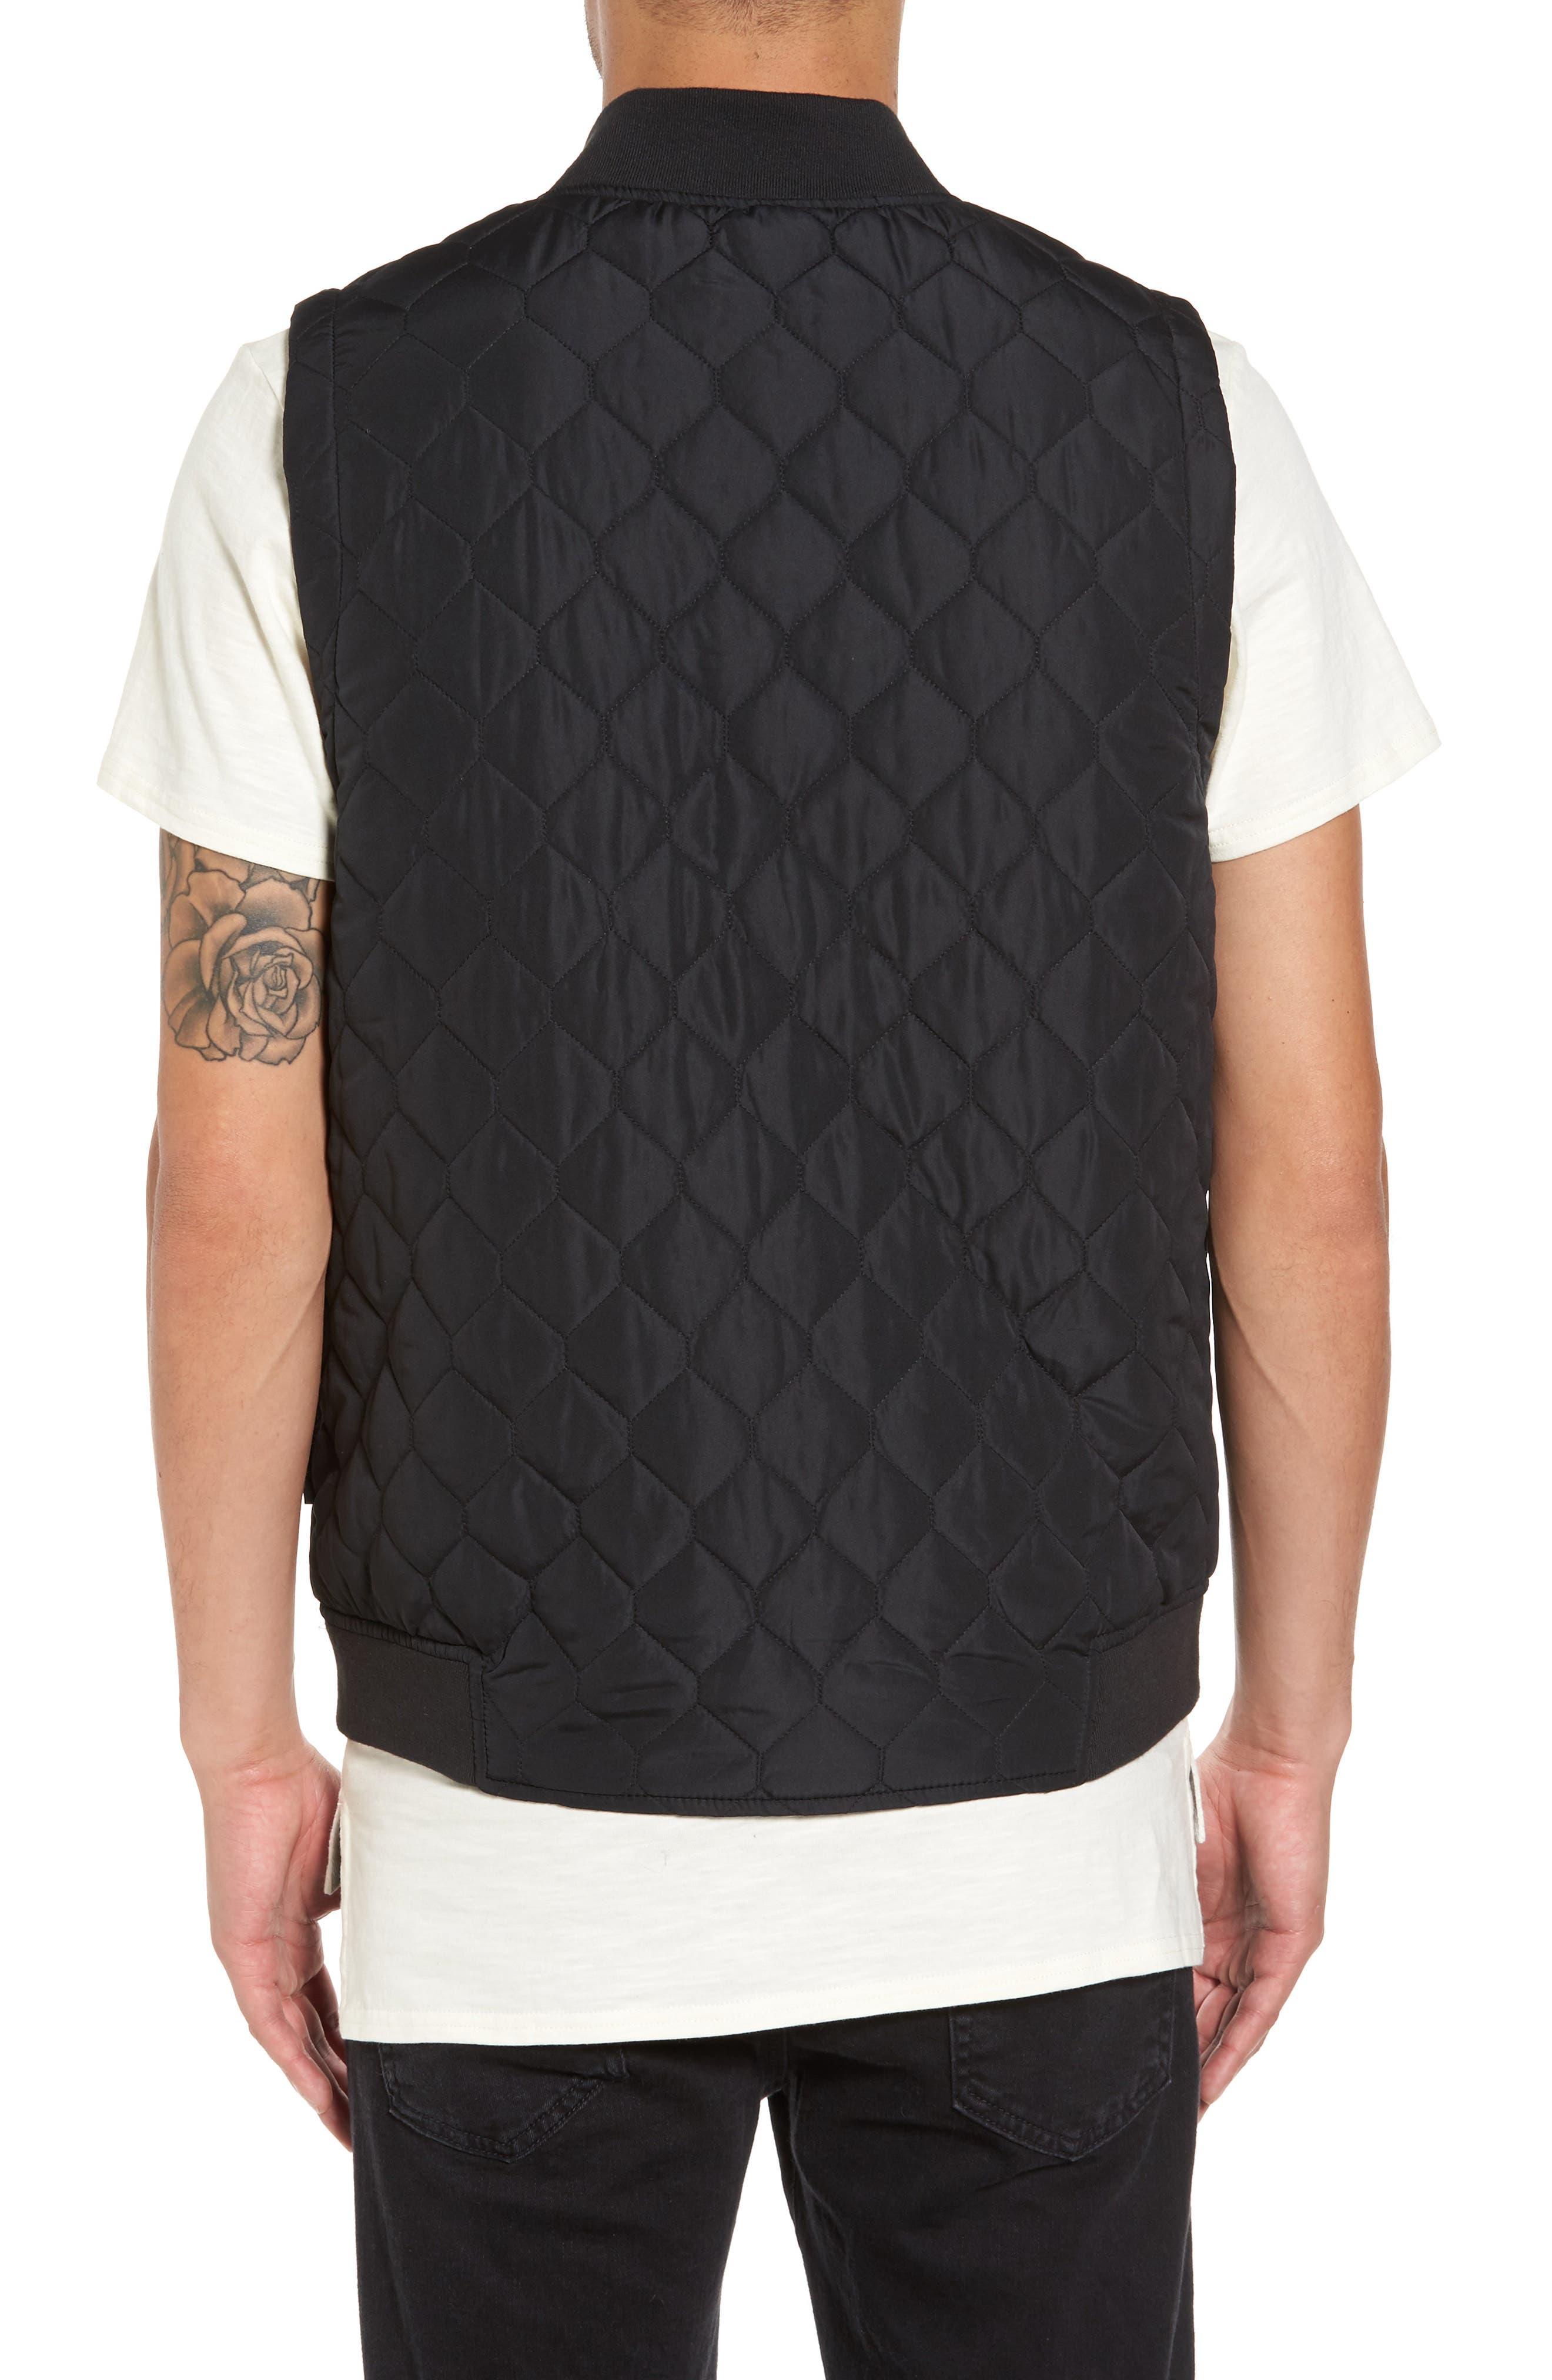 Replicant Quilted Vest,                             Alternate thumbnail 2, color,                             Black